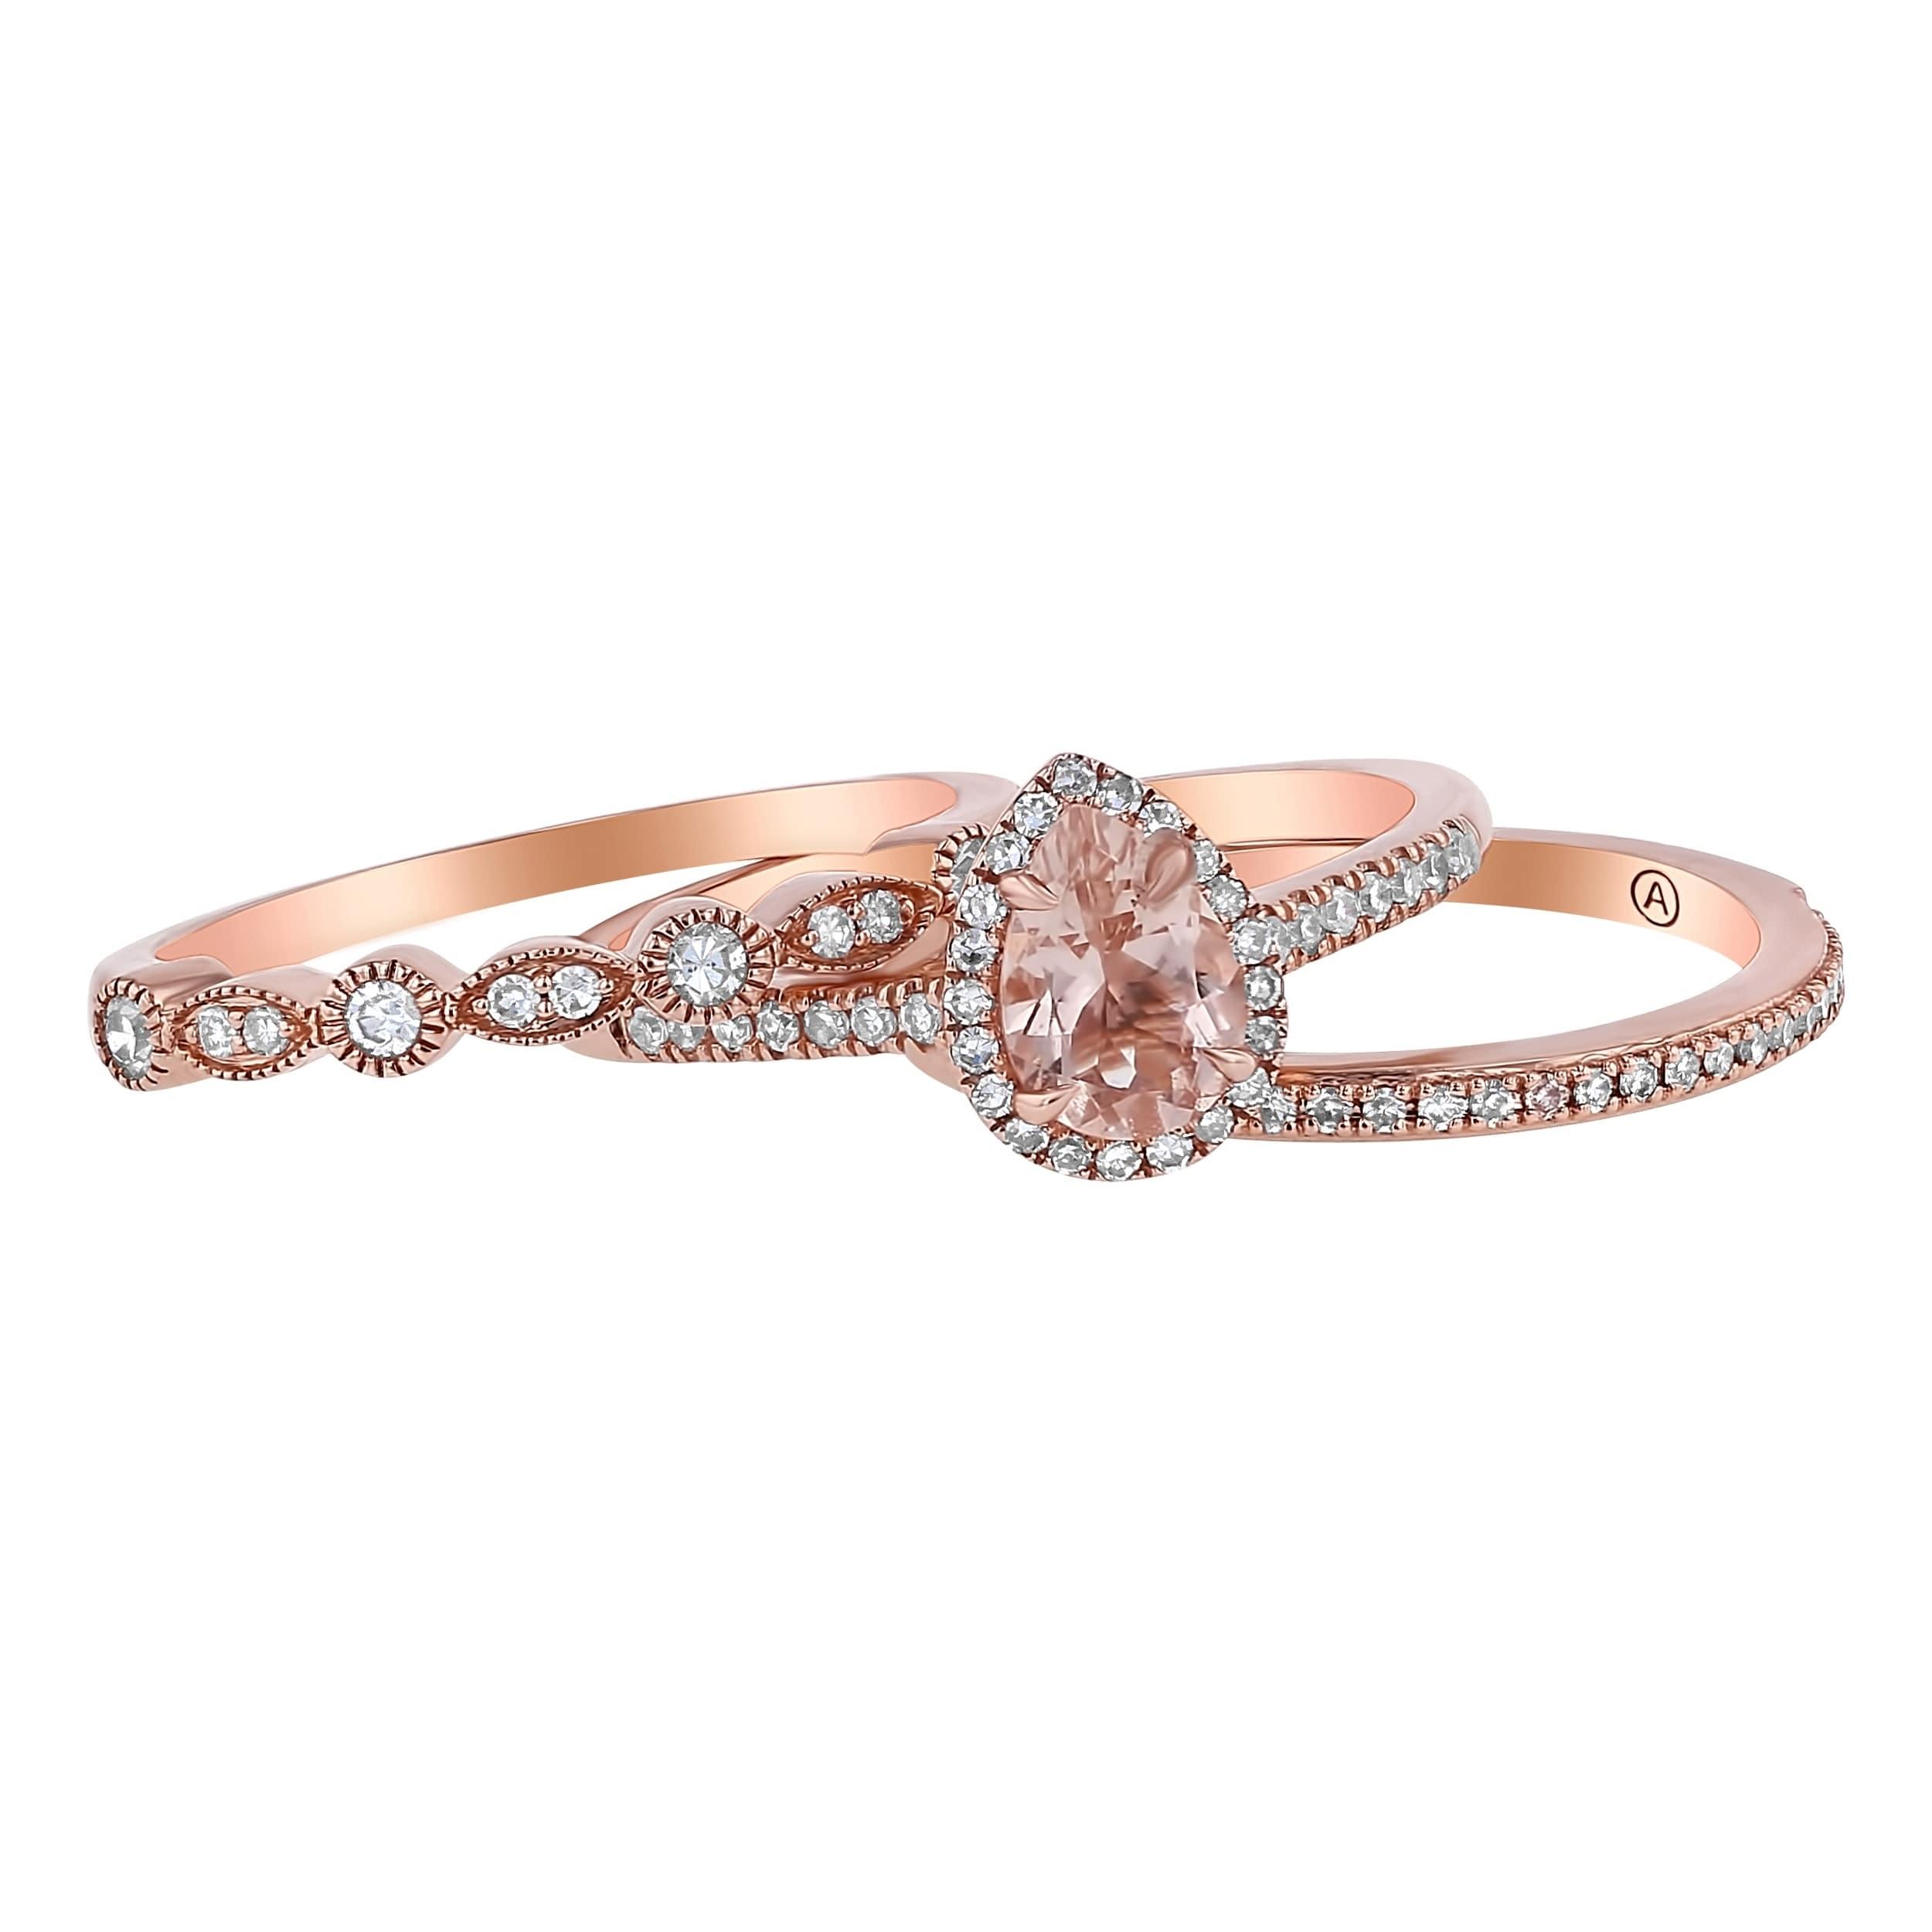 Morganite Wedding Set.14k Rose Gold Diamonds And Morganite Halo Wedding Band Set By Beverly Hills Charm